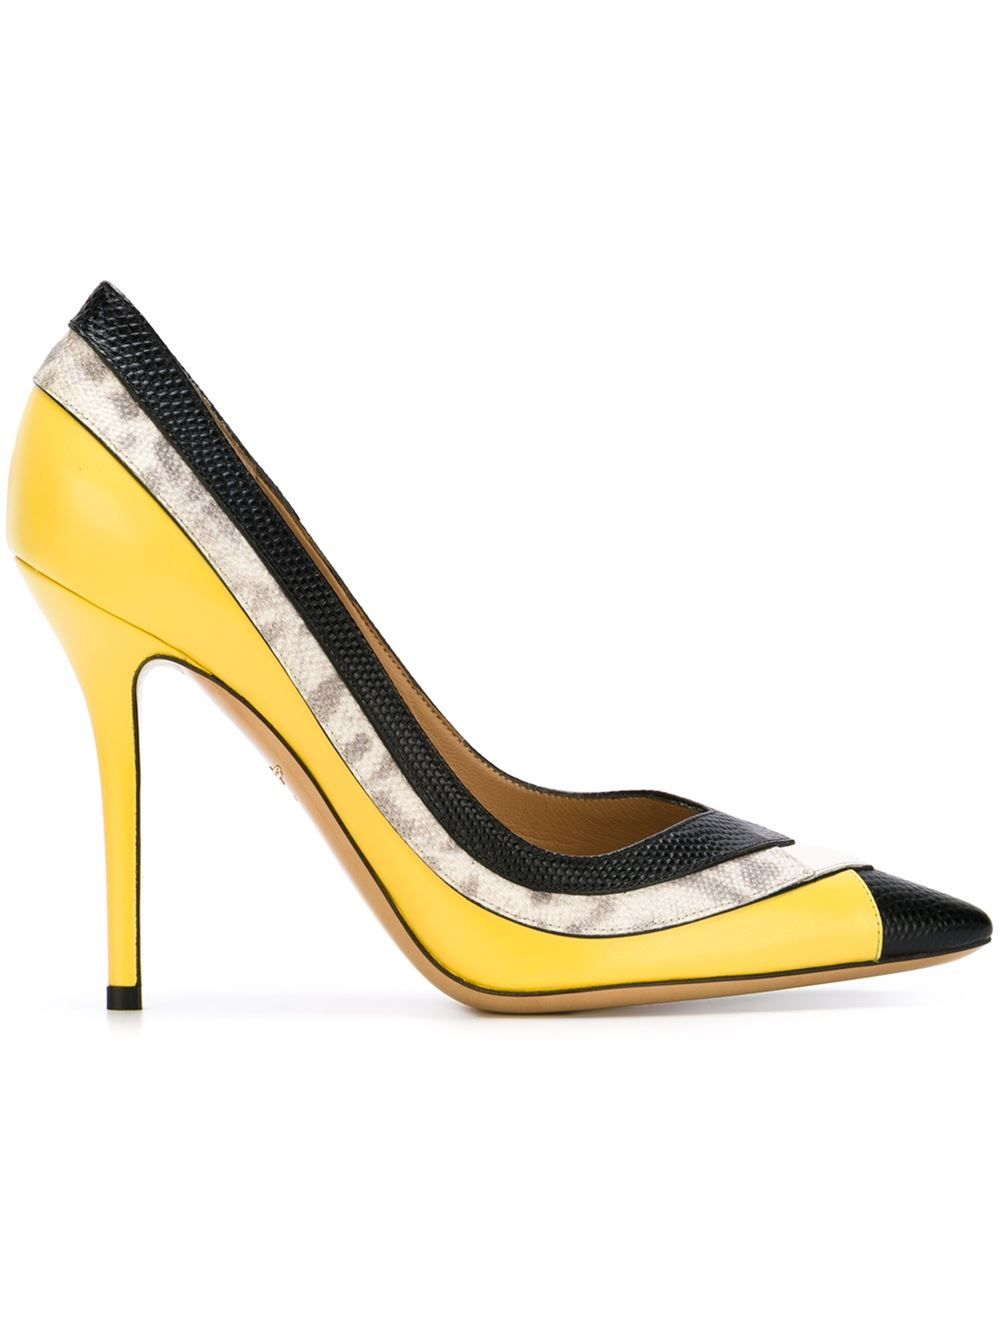 3164af3e9a13f Salvatore Ferragamo zapatos de tacón